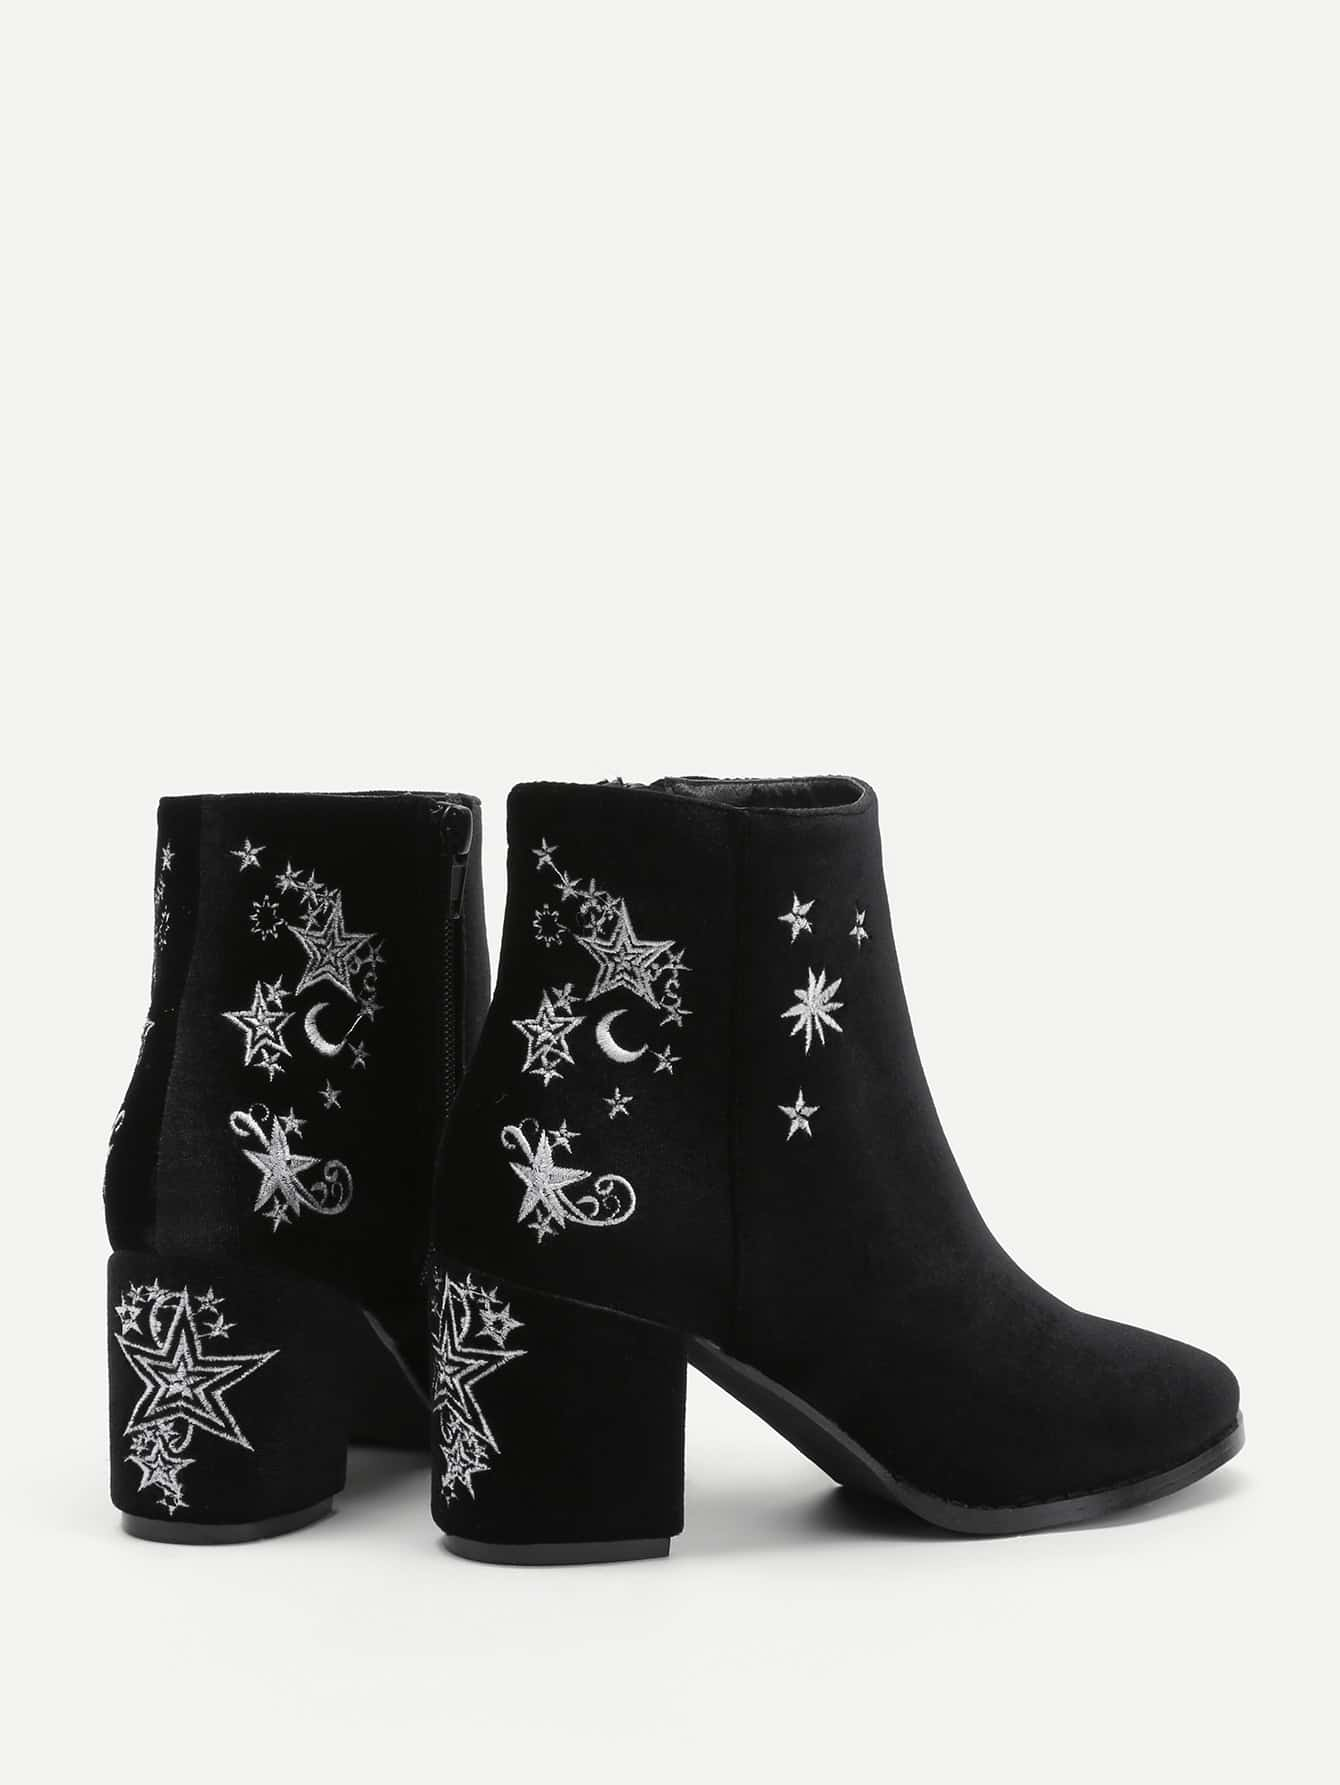 Moon Boot Nous Animaux - Chaussures - Bottines Botte De Lune 7LXBynkC